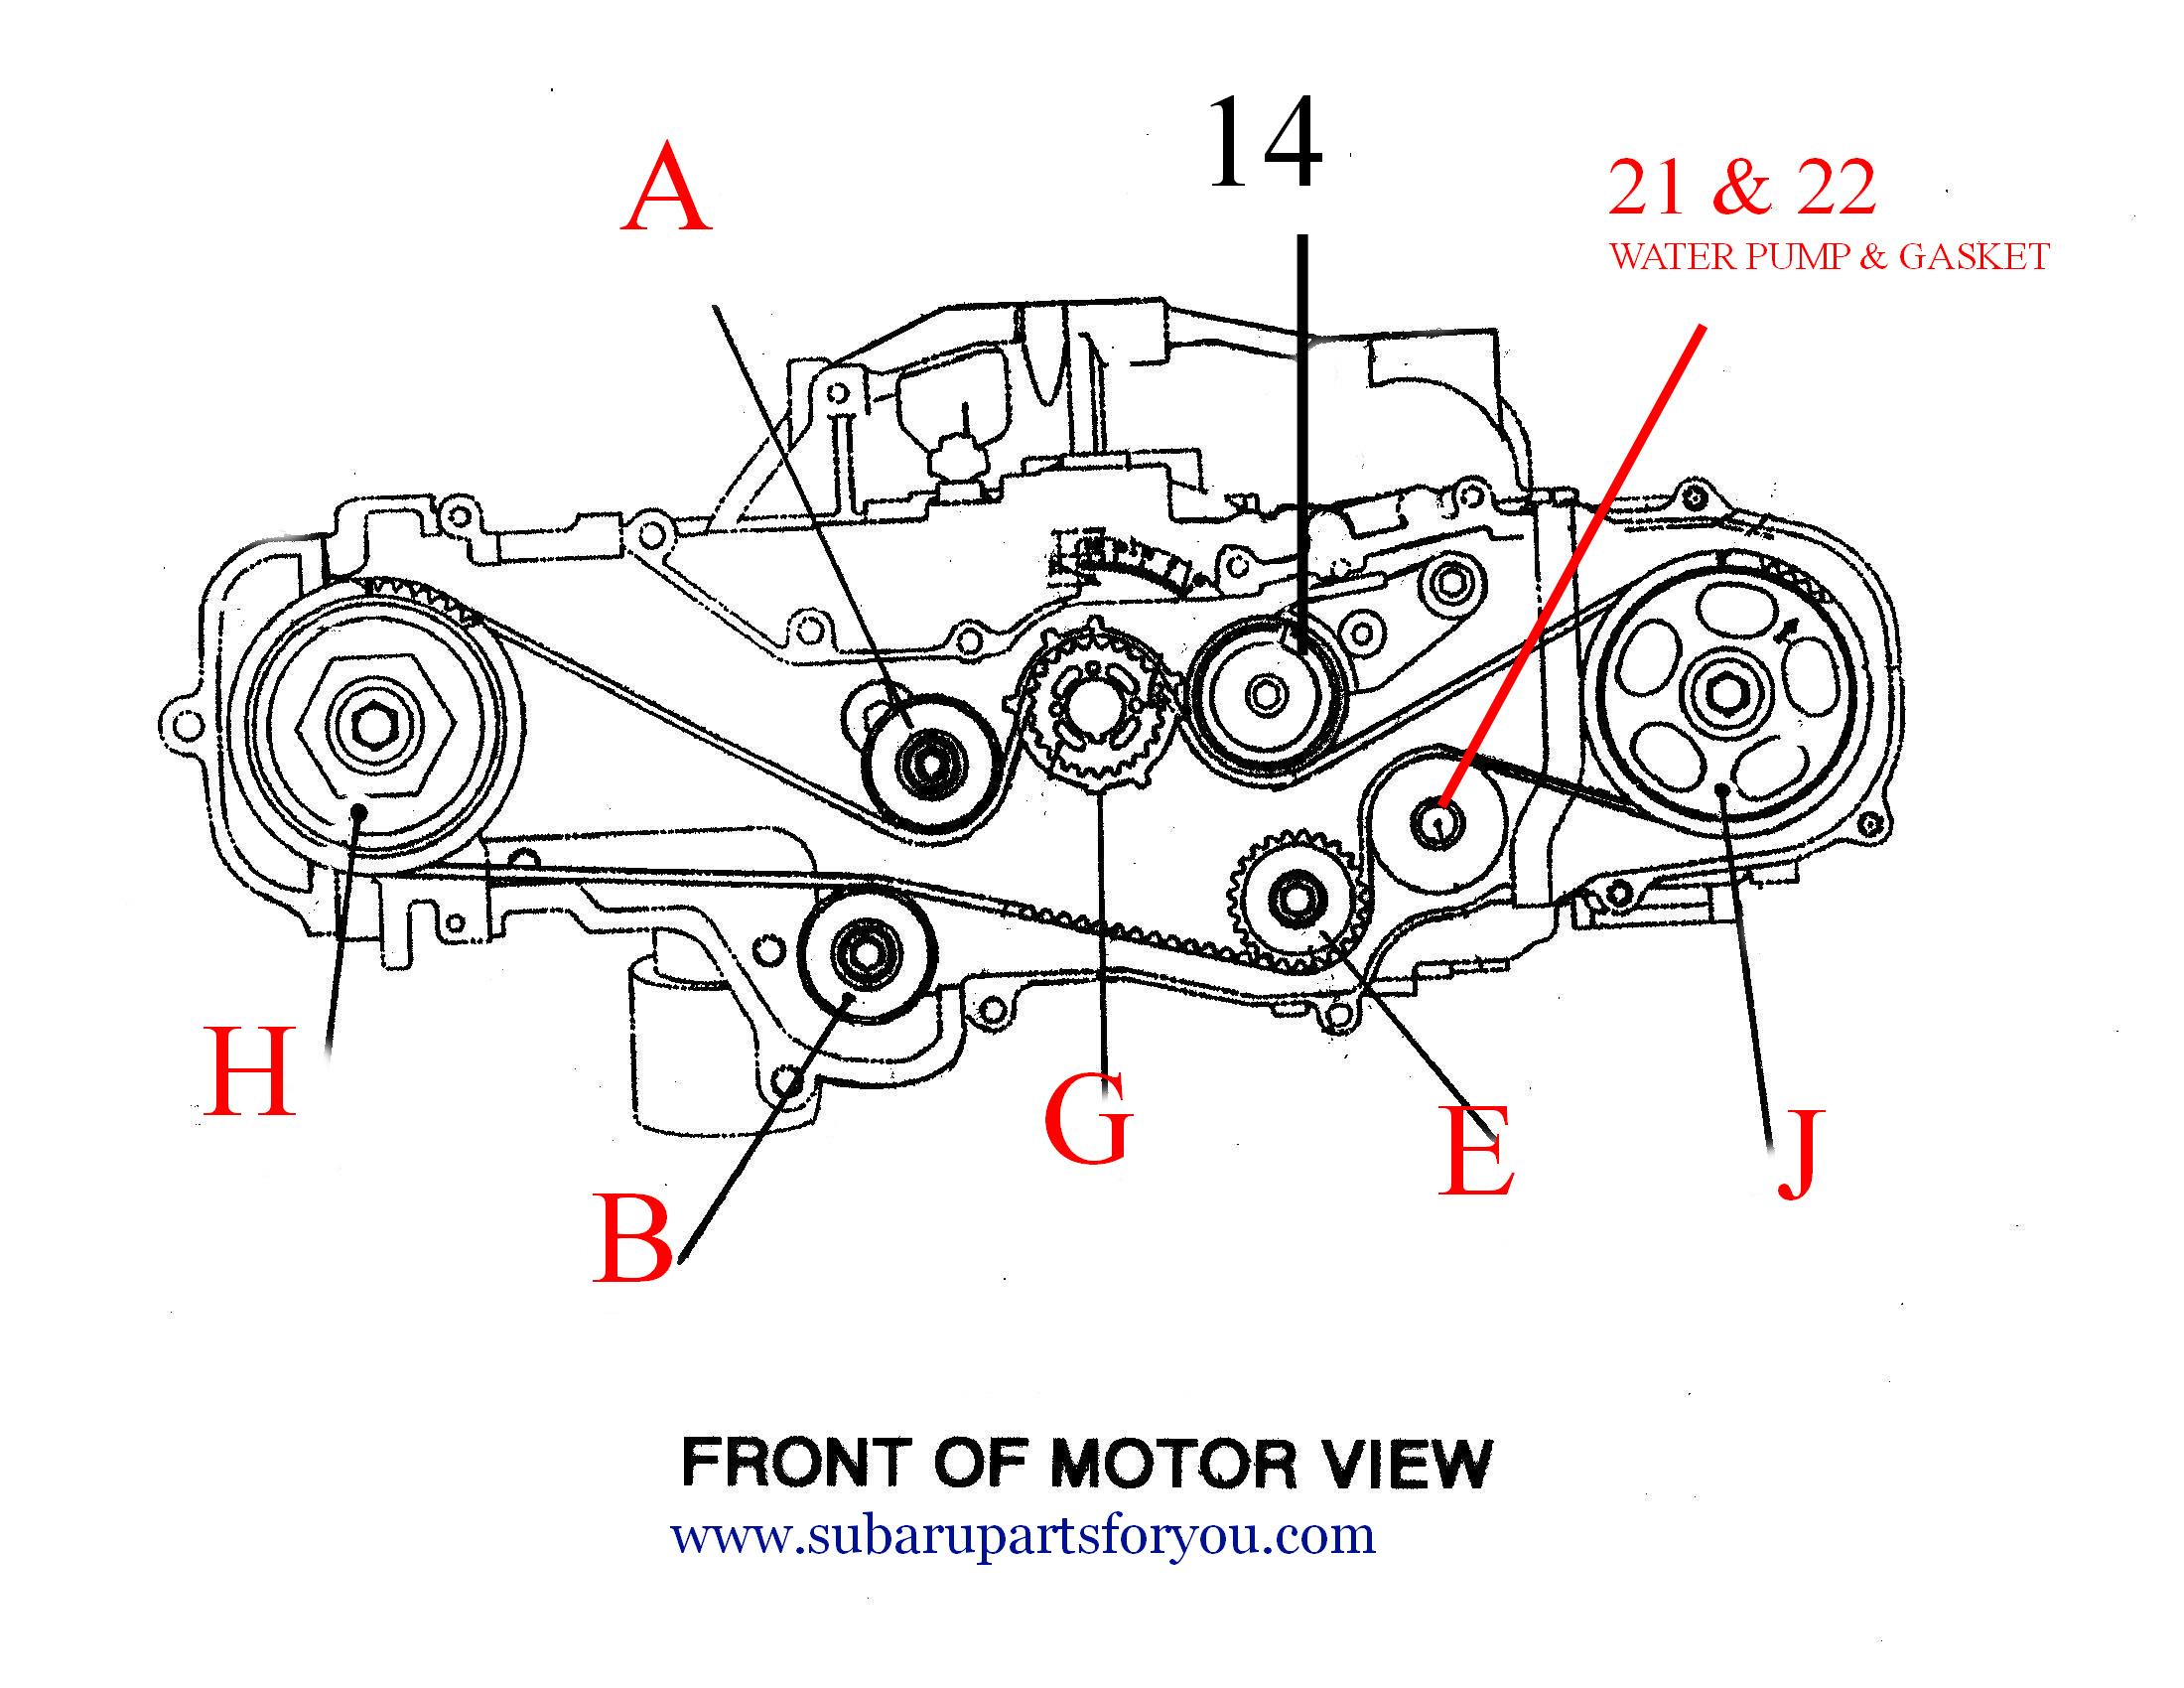 Subaru Ej Wiring Diagram Outback. Subaru. Auto Wiring Diagram